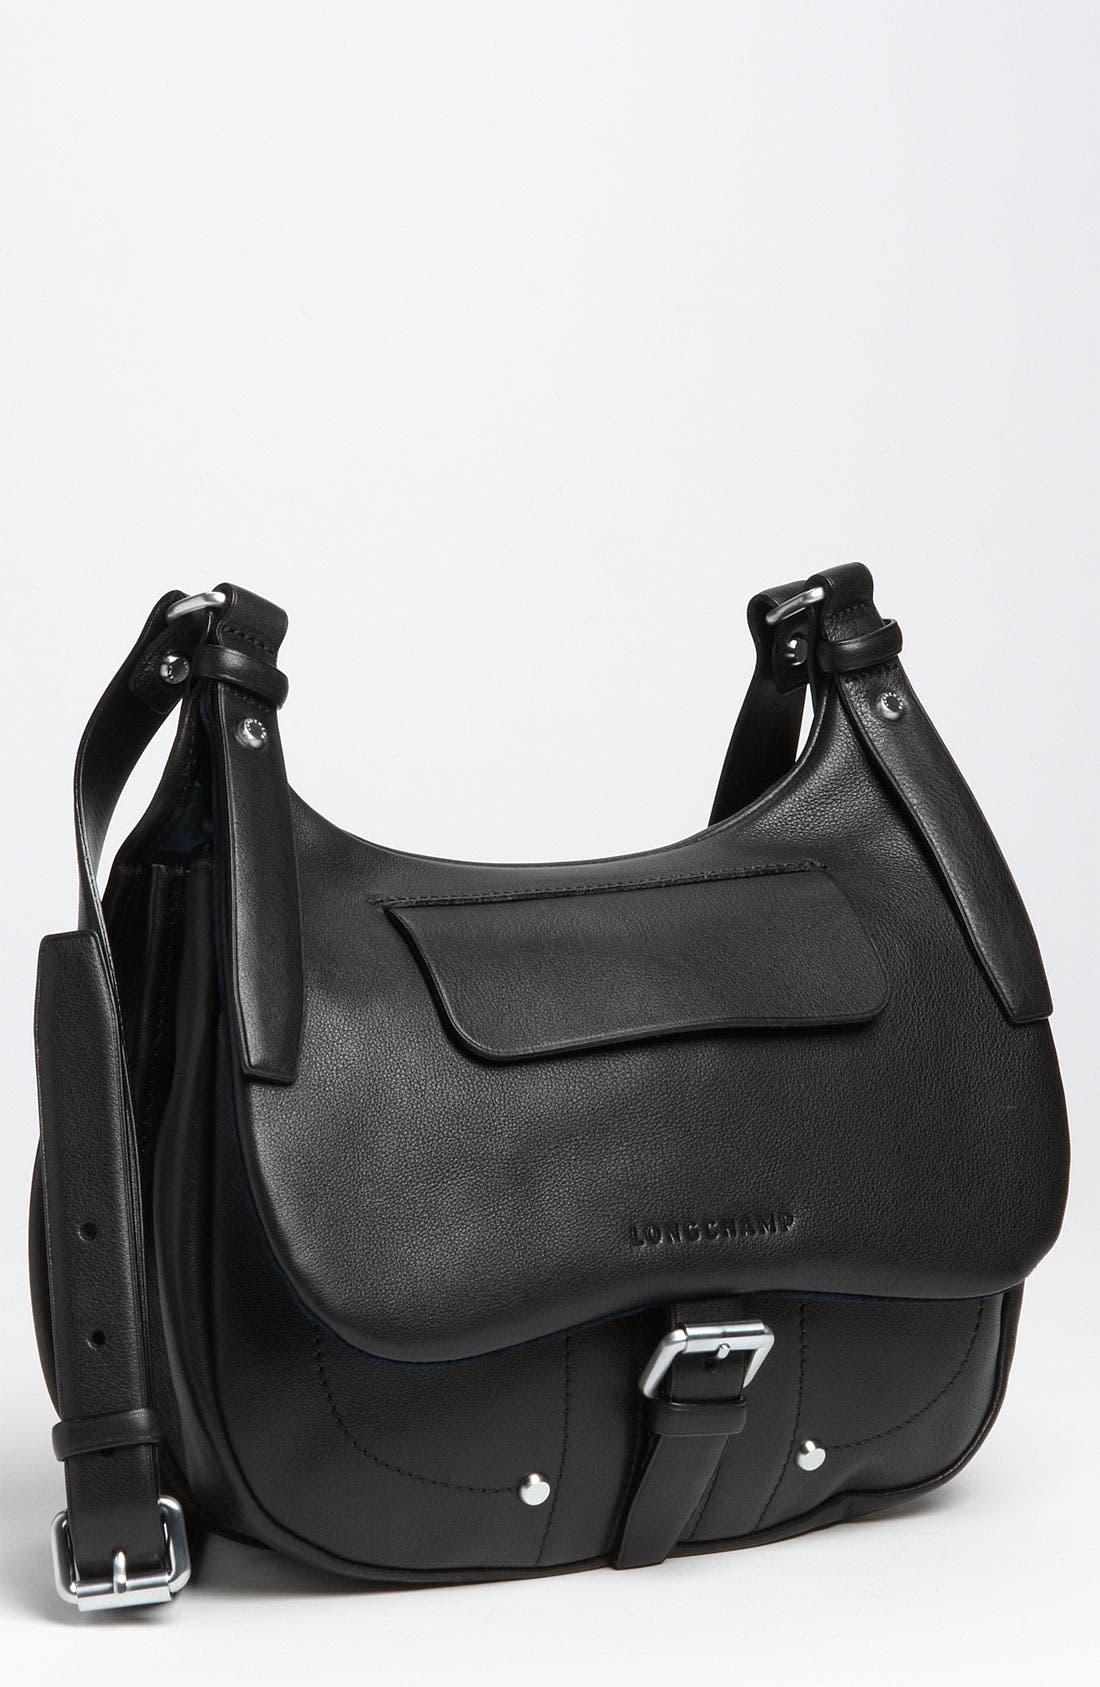 Alternate Image 1 Selected - Longchamp 'Balzane' Crossbody Bag